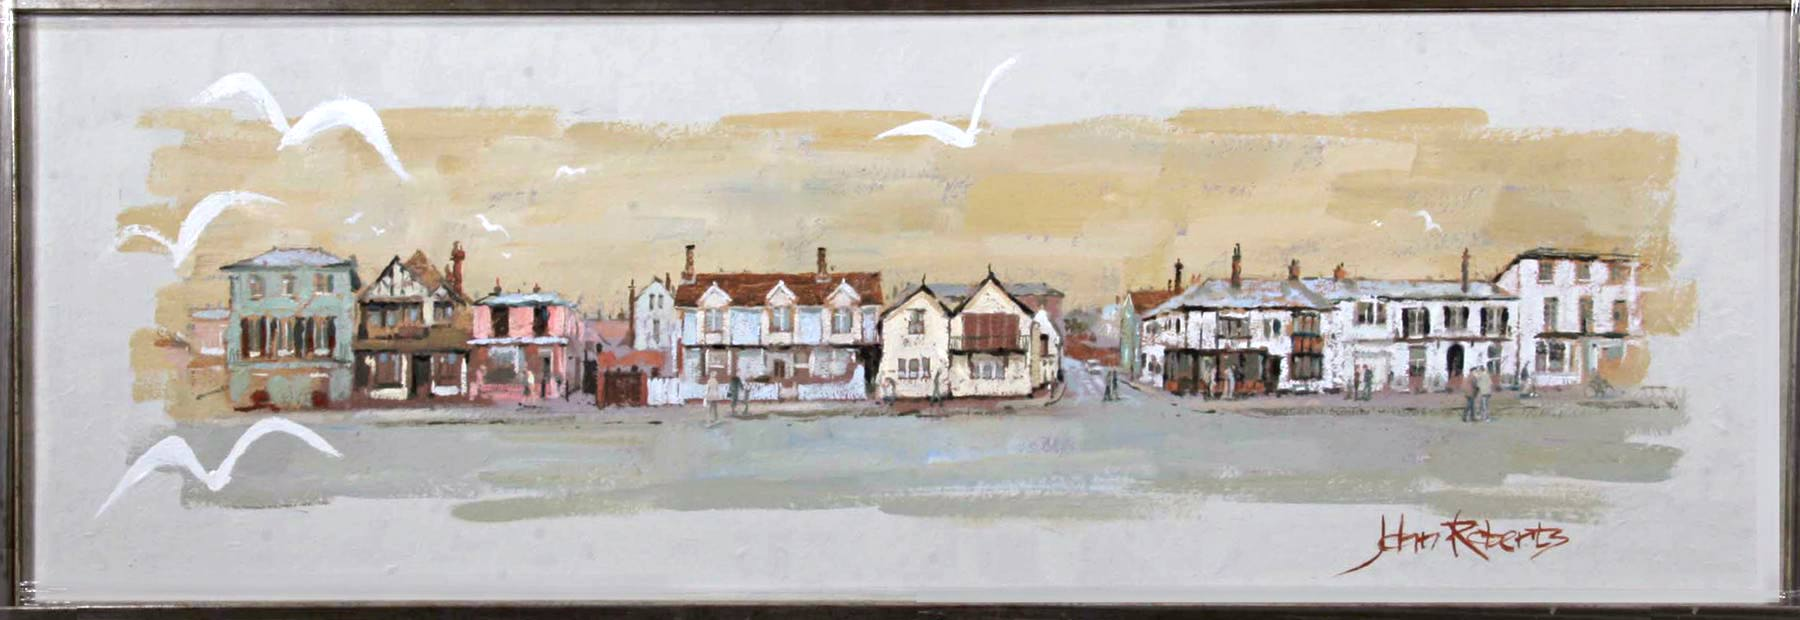 John Roberts – Aldeburgh Seafront